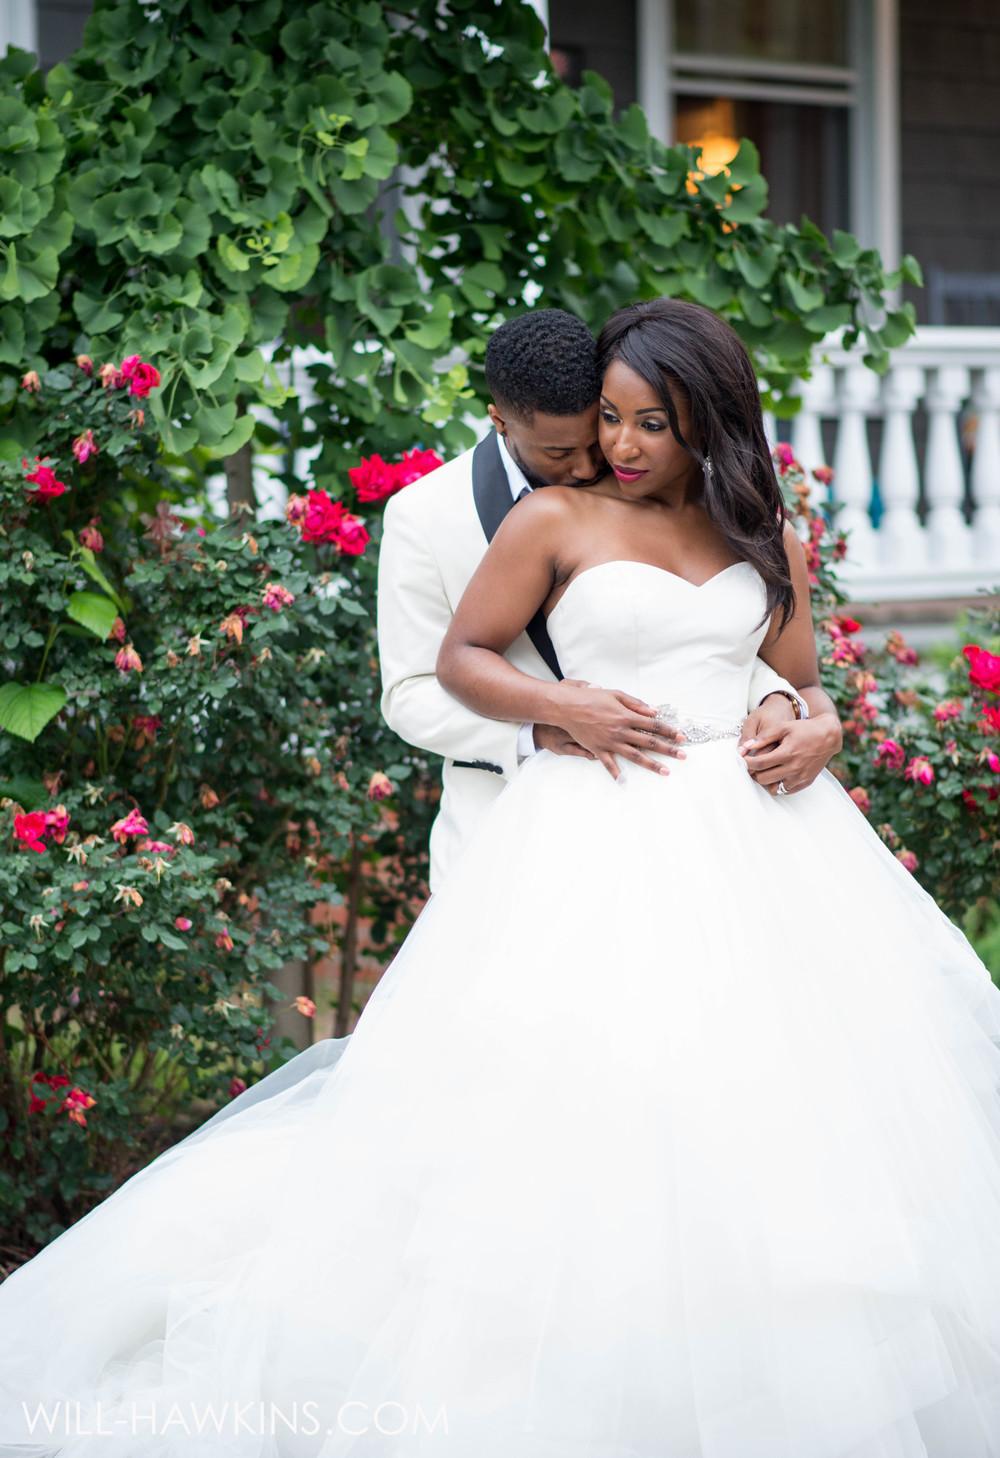 Virginia Wedding Photographer Will Hawkins Photography Virginia Beach Wedding Photographer Chrysler Museum of Art